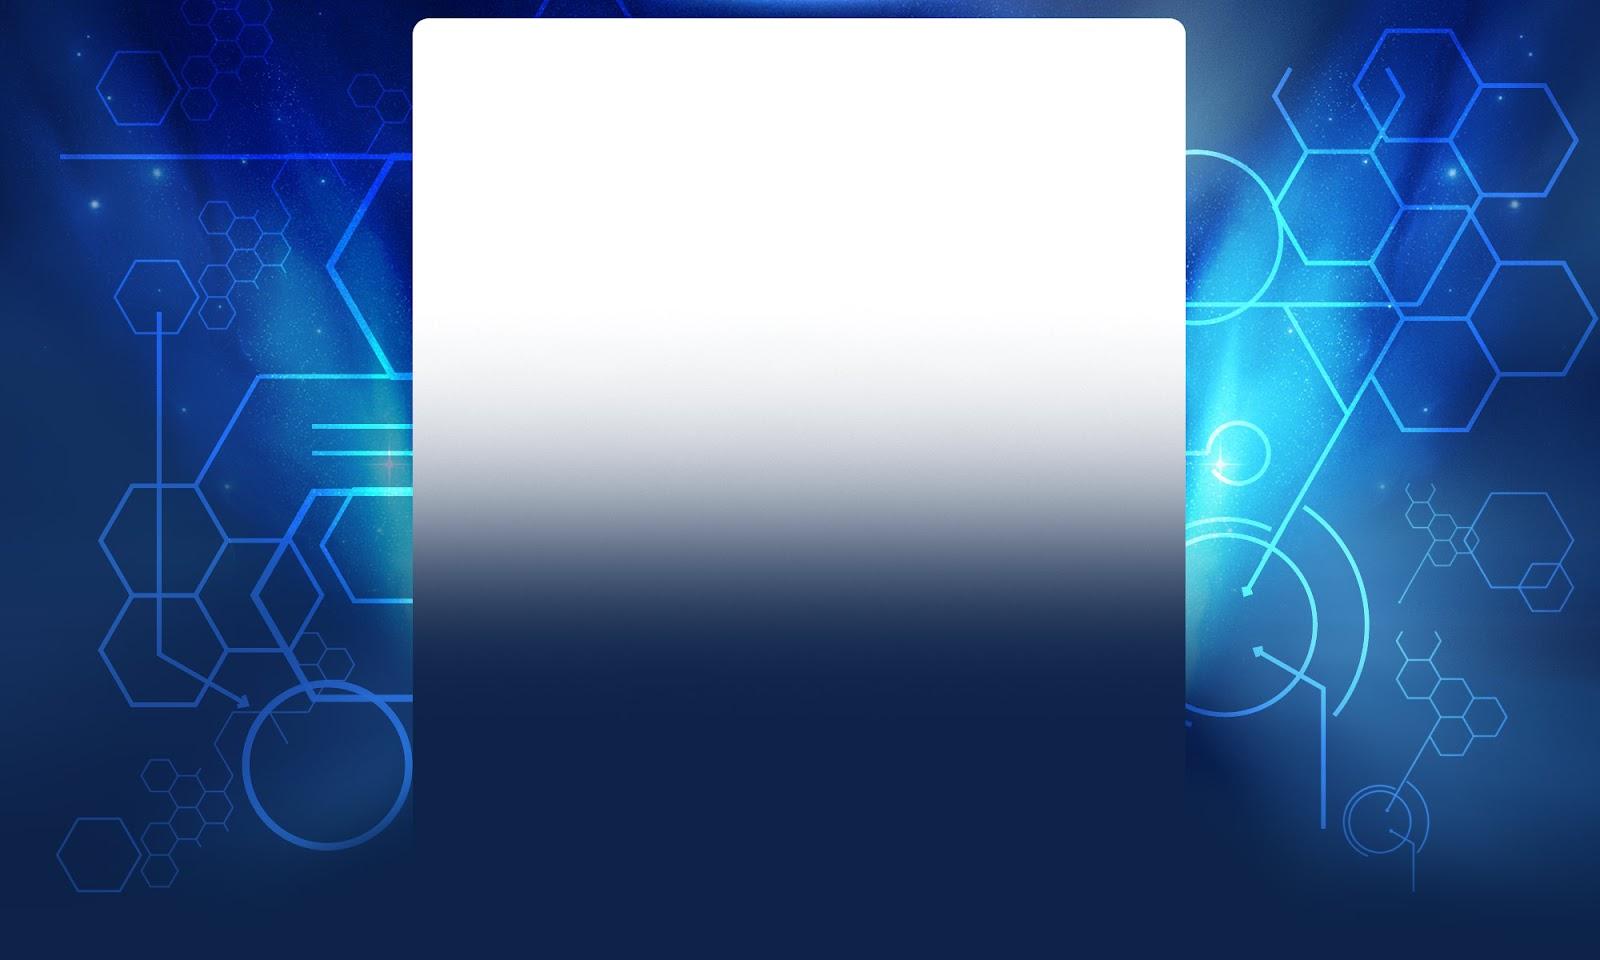 http://3.bp.blogspot.com/-v_537KdSLLw/UFZ7YbogtxI/AAAAAAAABy4/ev0EGdcRsYA/s1600/Square+Net+Background.jpg